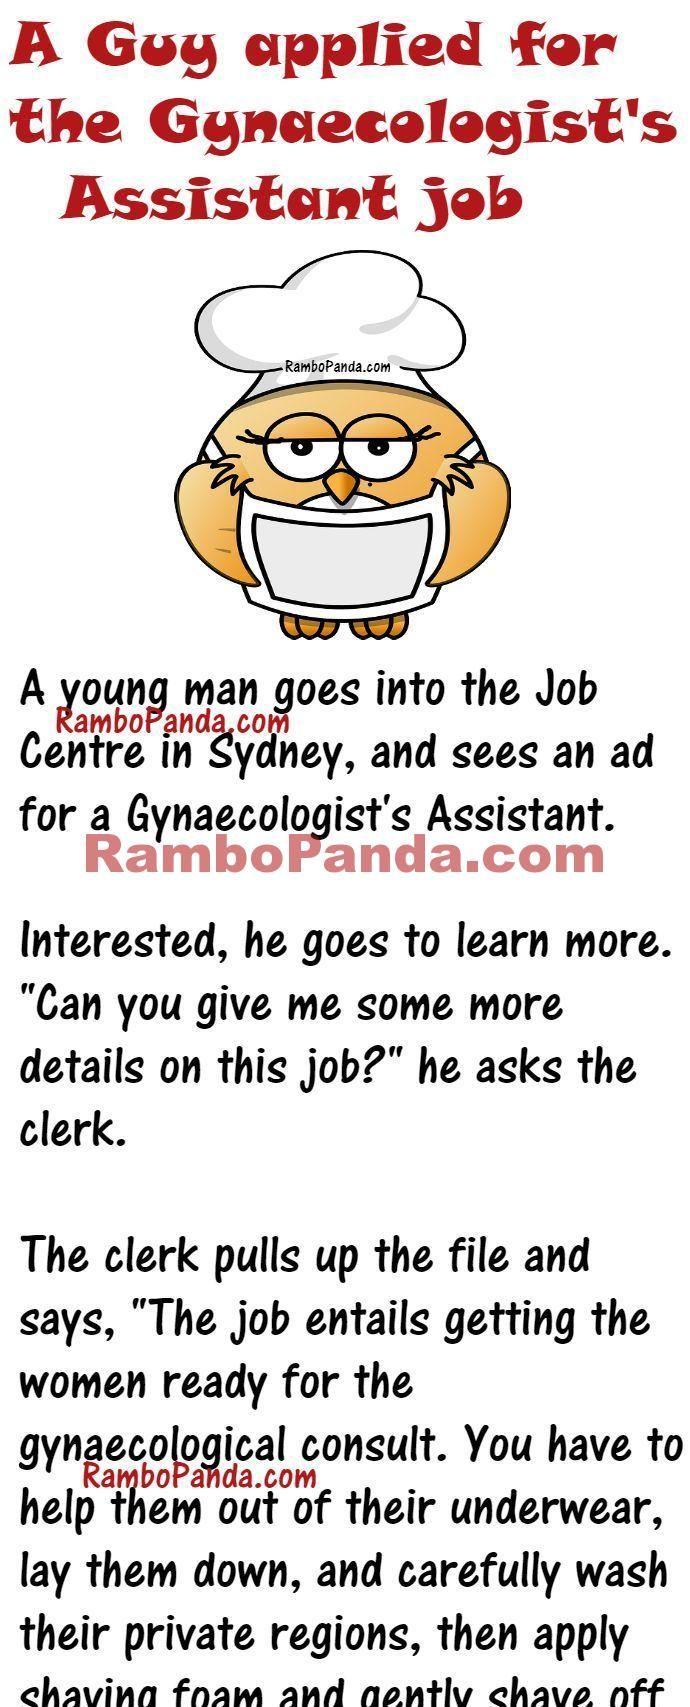 A Guy Was Looking For A Job Silly Jokes Mom Jokes Joke Stories